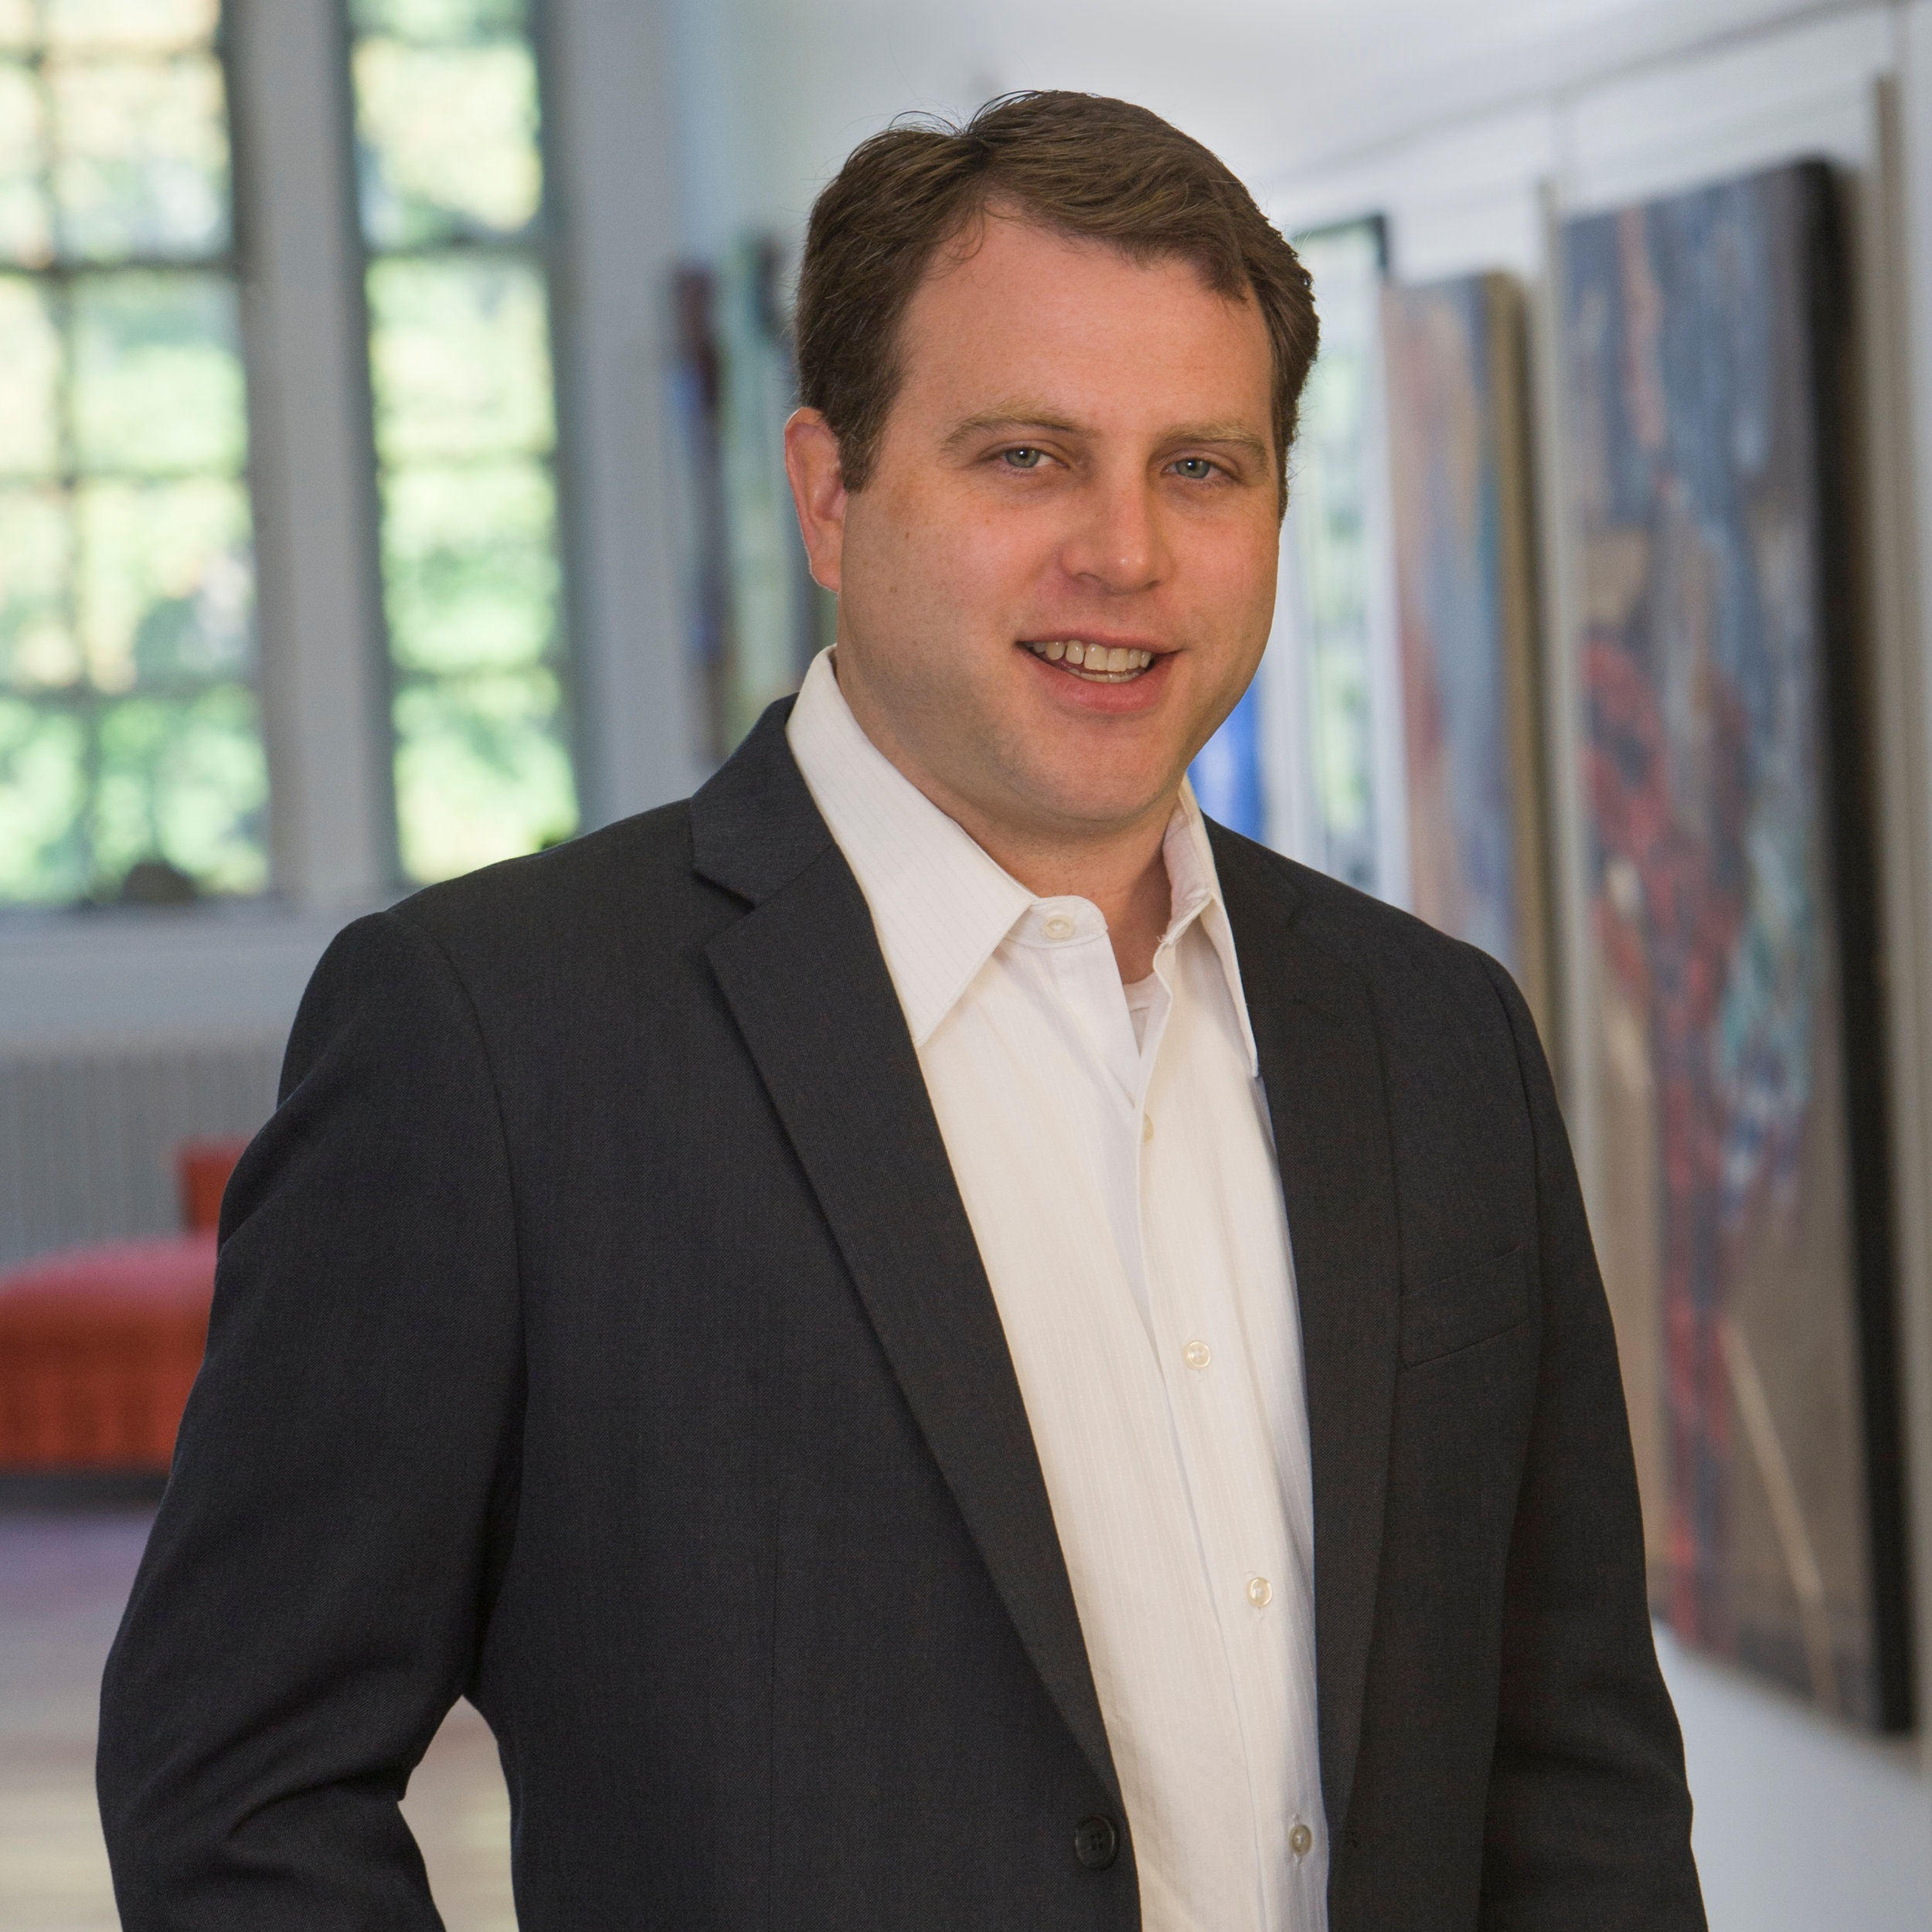 Jason Springer, Umbrella Community Arts Center, MA